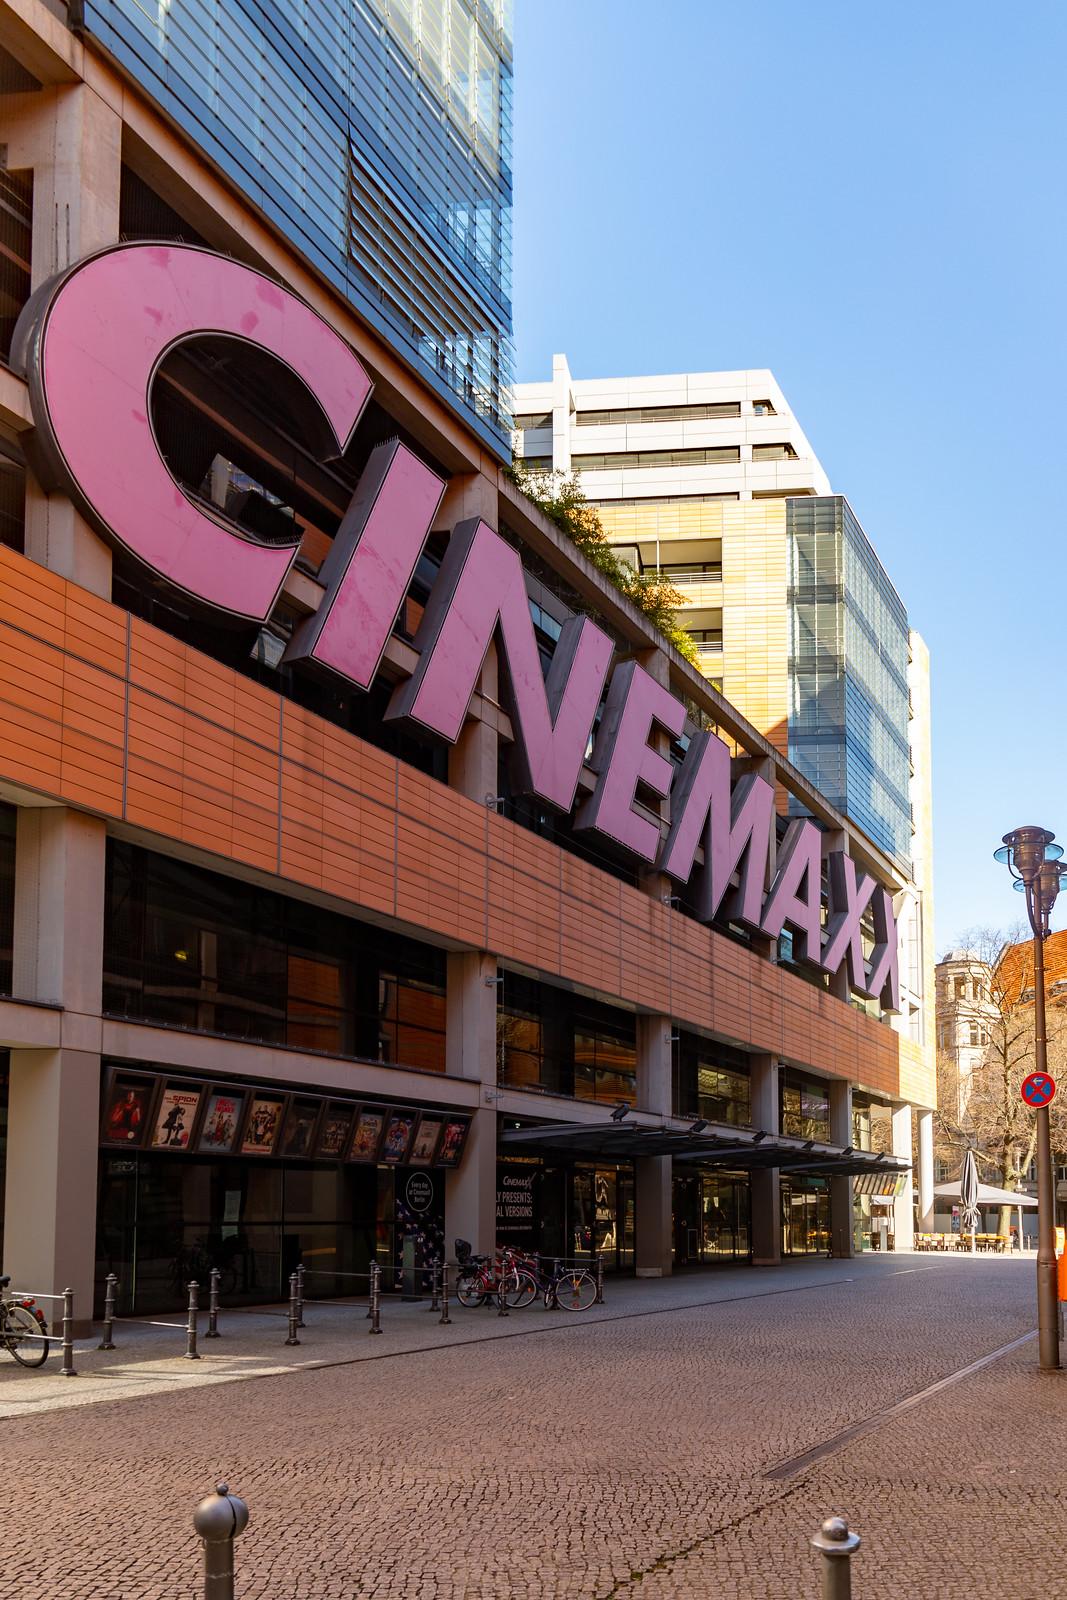 Das CinemaxX-Kino am Potsdamer Platz